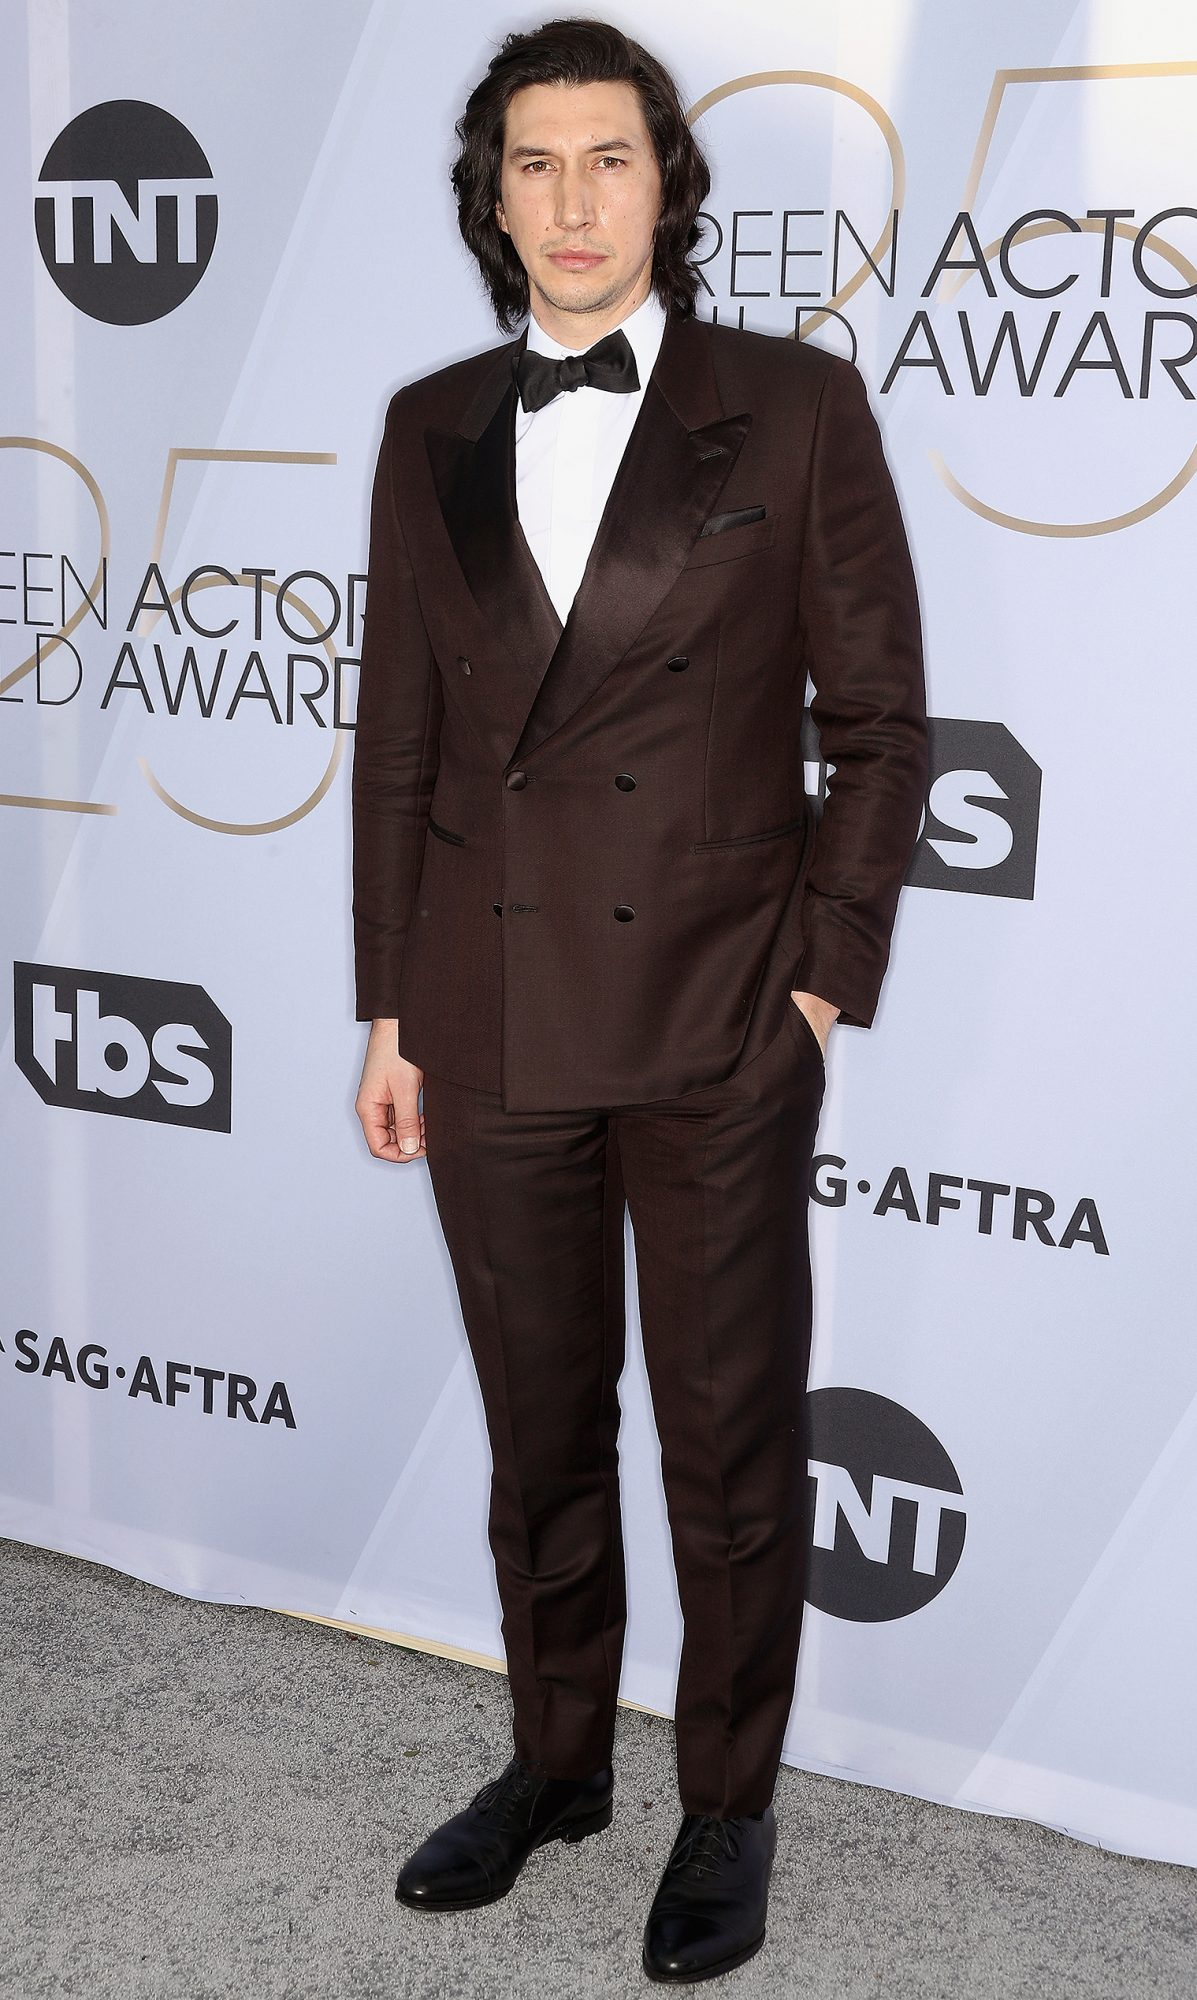 25th Annual Screen Actors Guild Awards - Arrivals